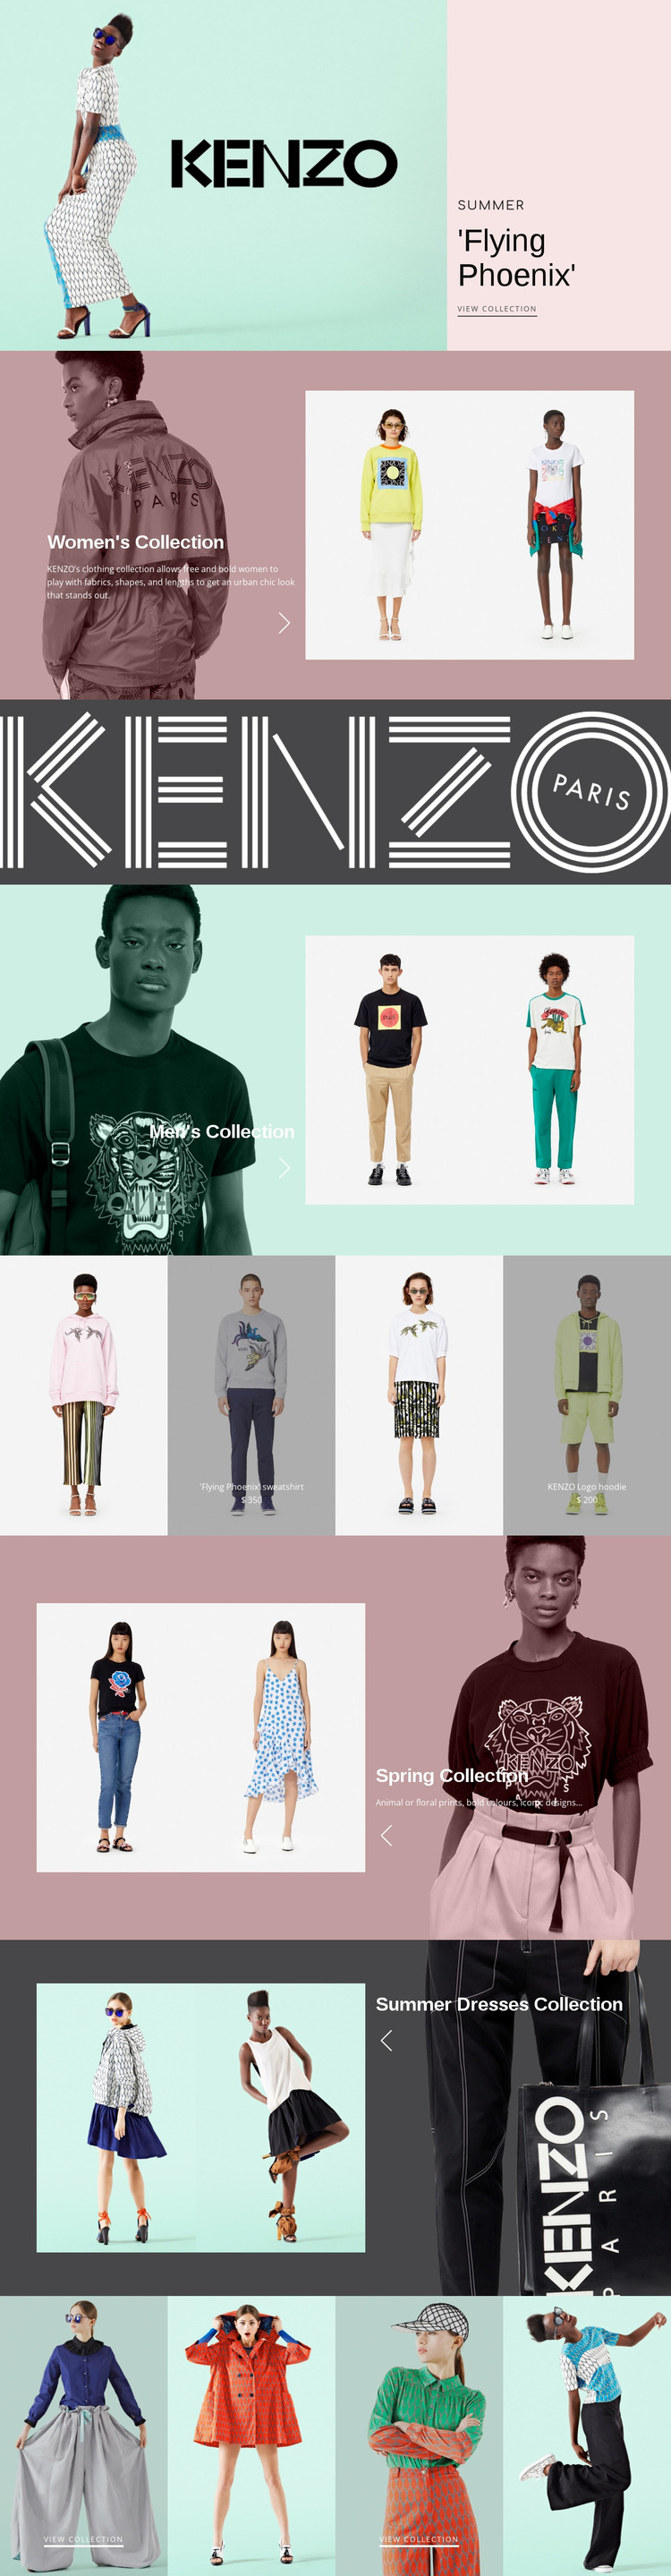 Atelier of modern fashion Website Mockup